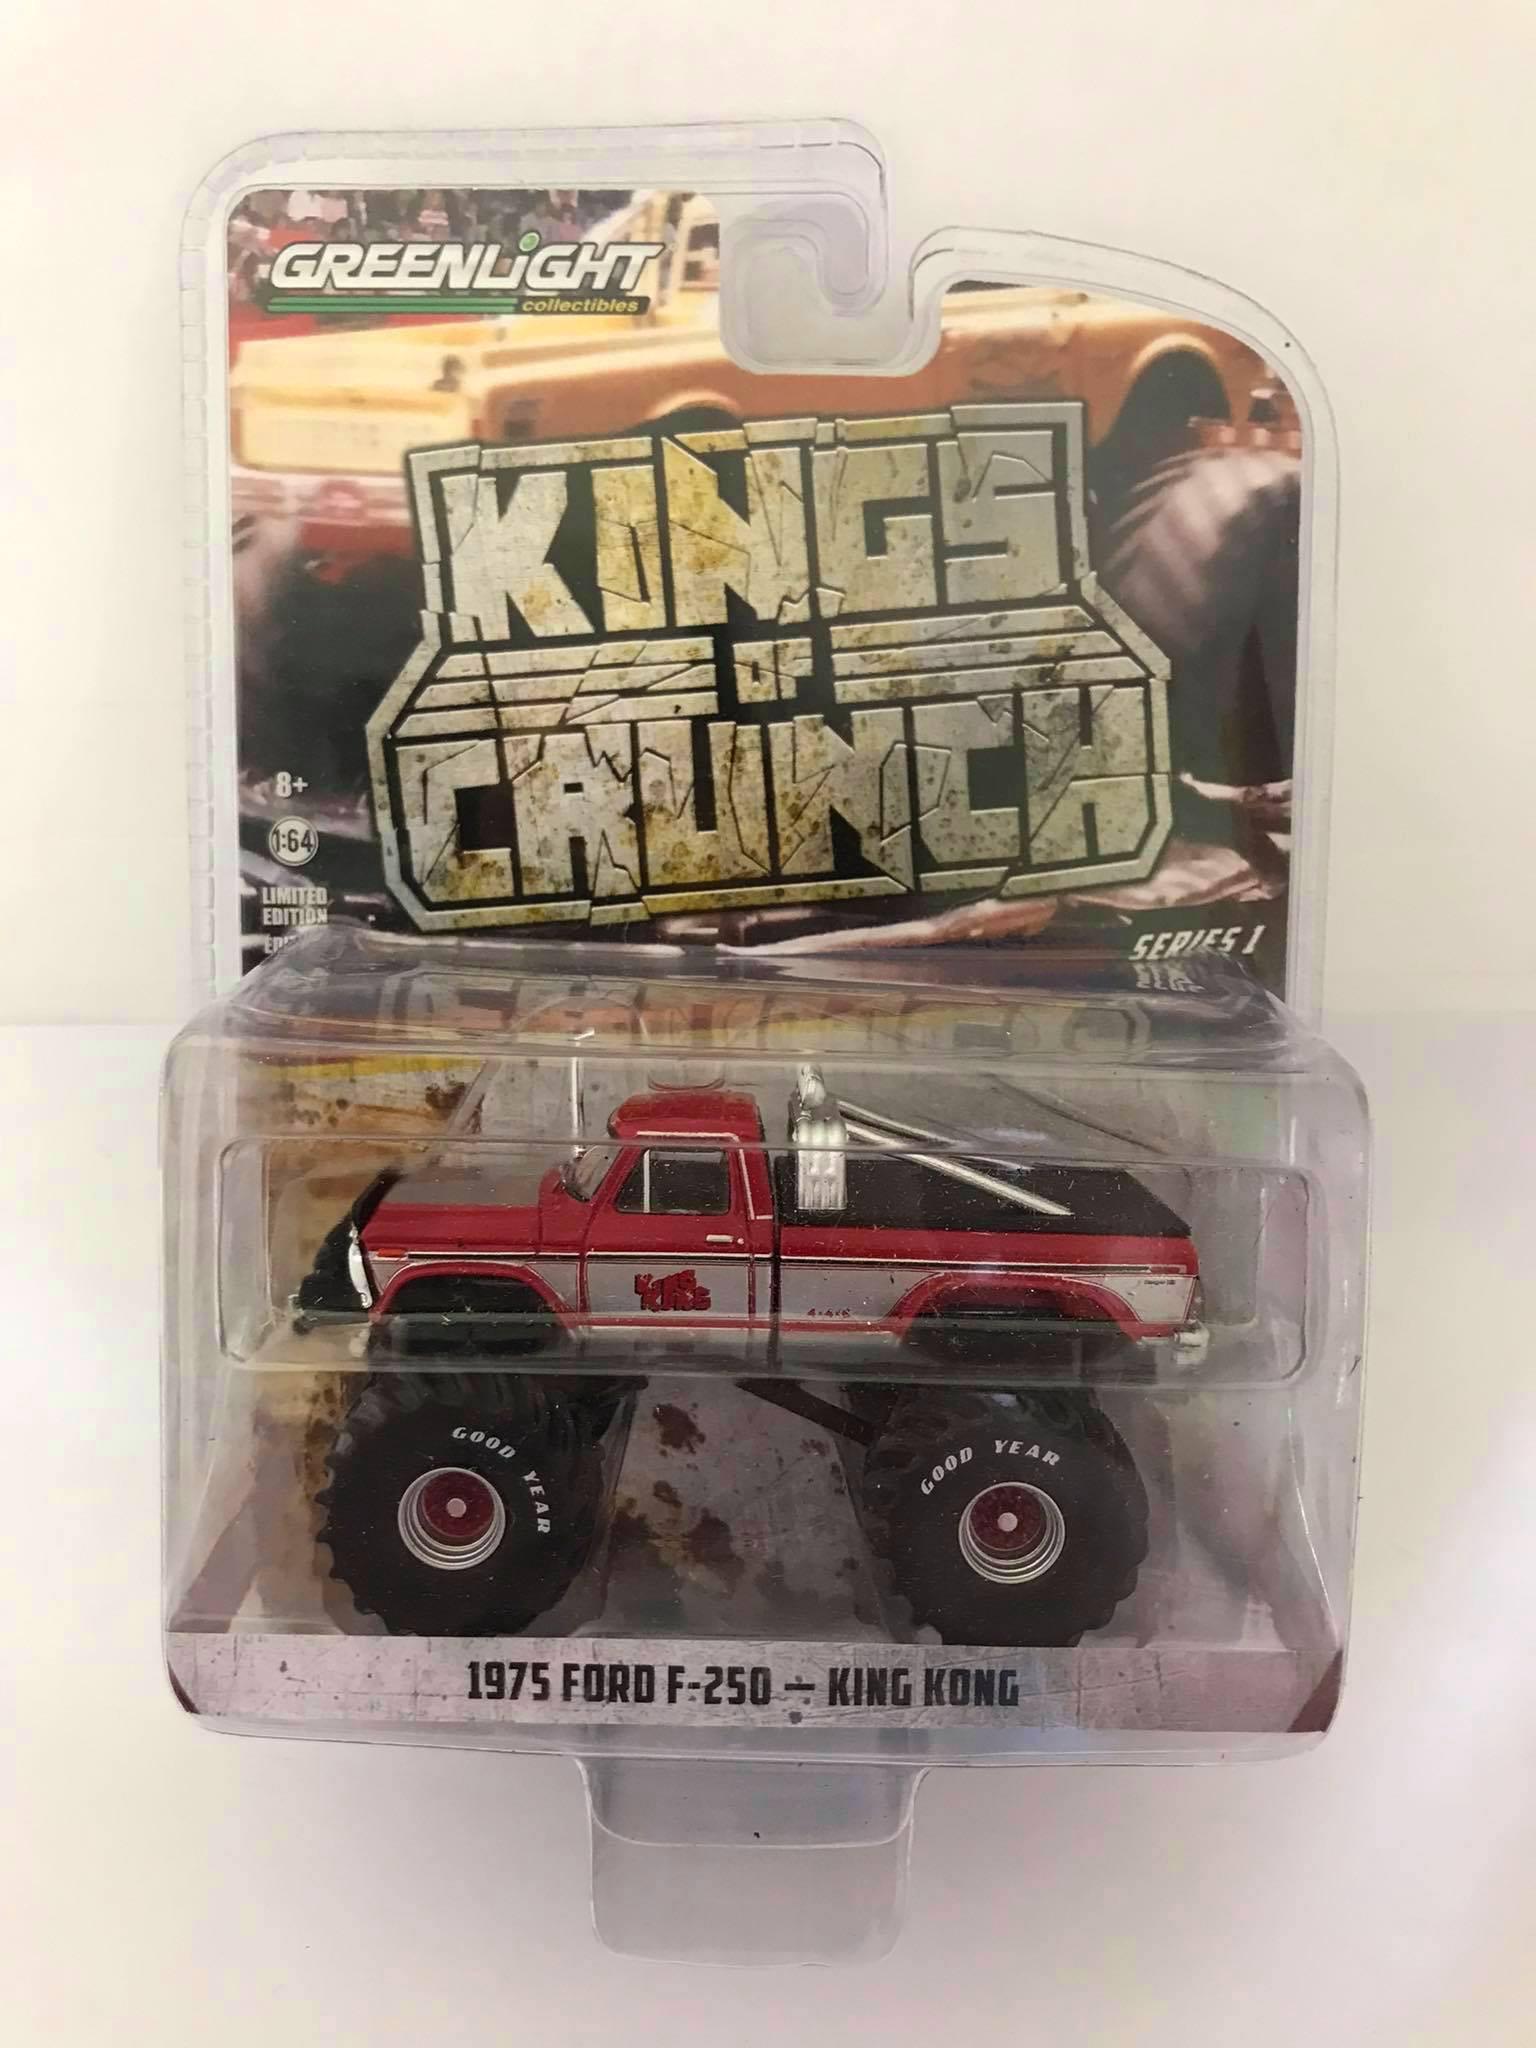 Greenlight - 1975 Ford F-250 Vermelho - King Kong - Kings of Crunch